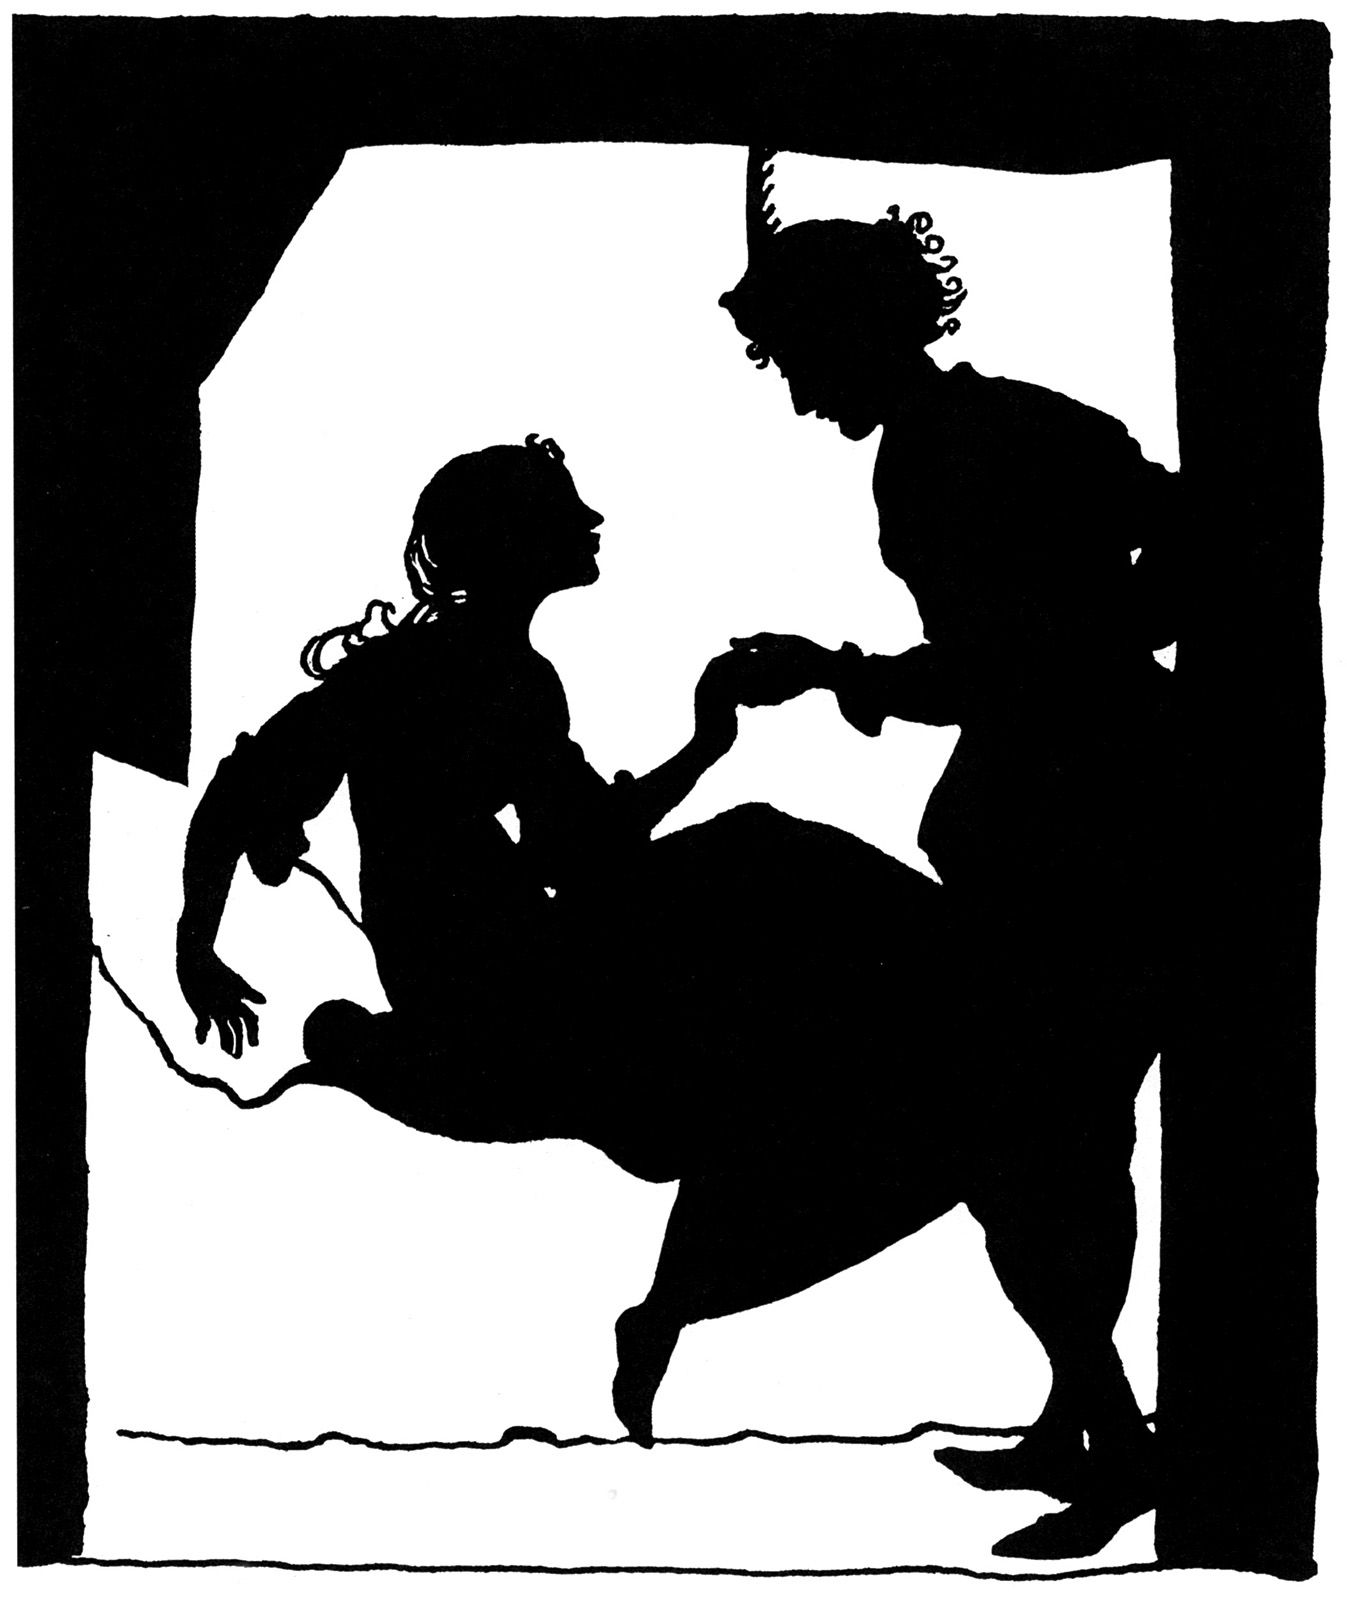 """The Sleeping Beauty"" illustrated by Arthur Rackham"